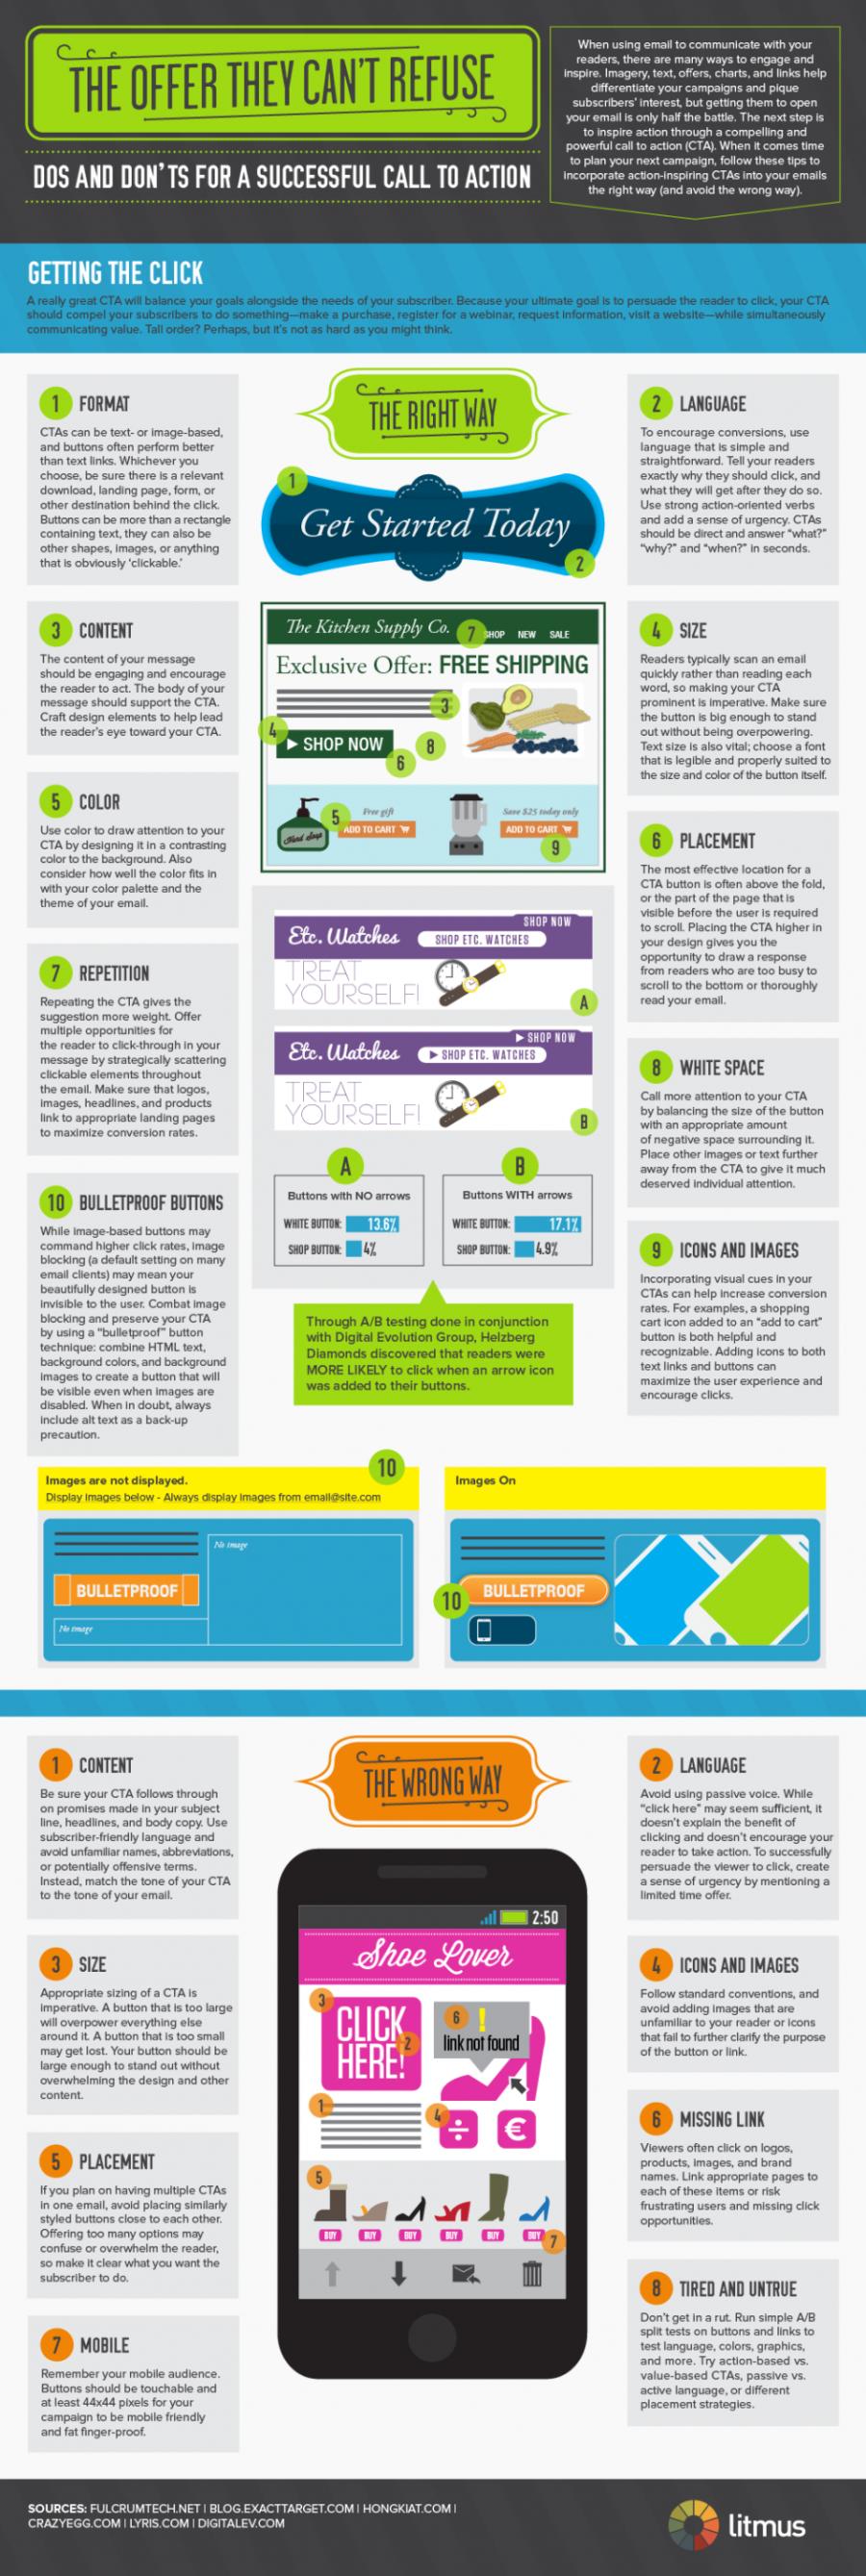 infografik-call-to-action-gestaltung